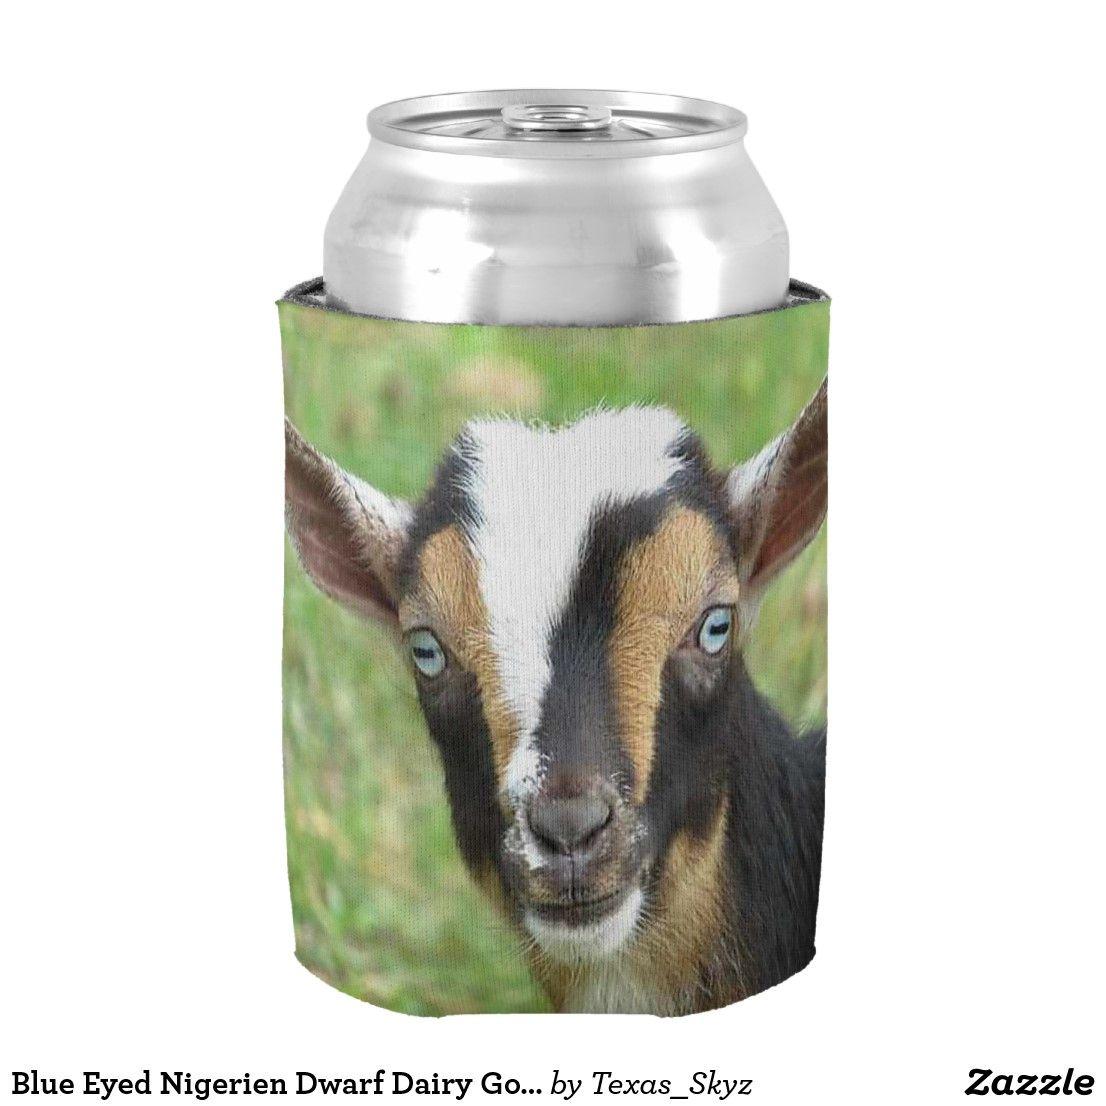 Blue eyed nigerien dwarf dairy goat can cooler zazzle